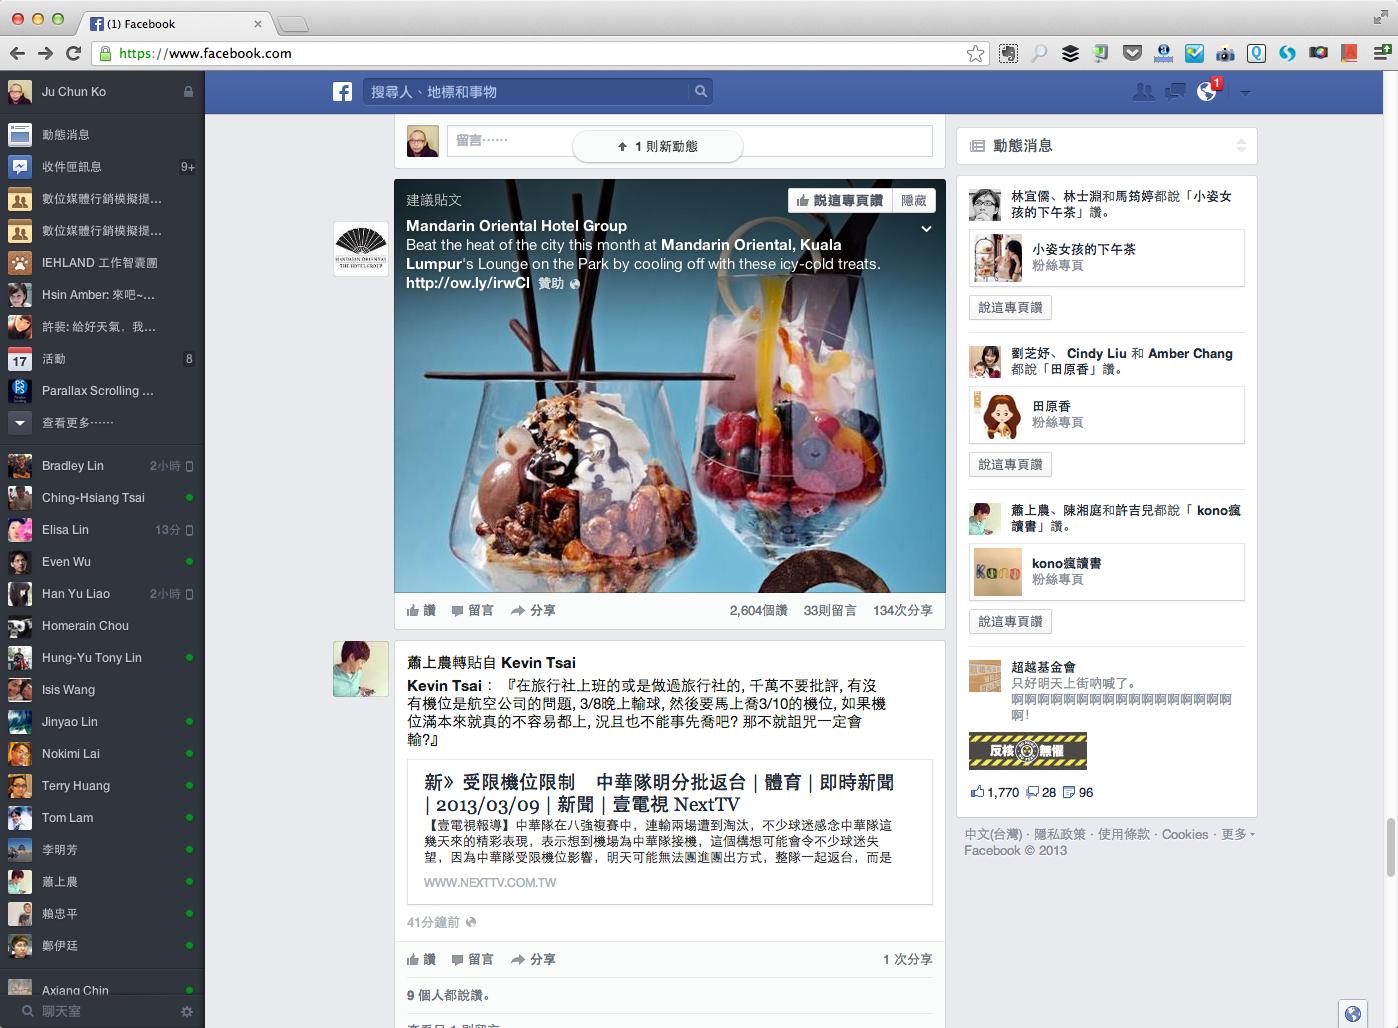 (1) Facebook-10